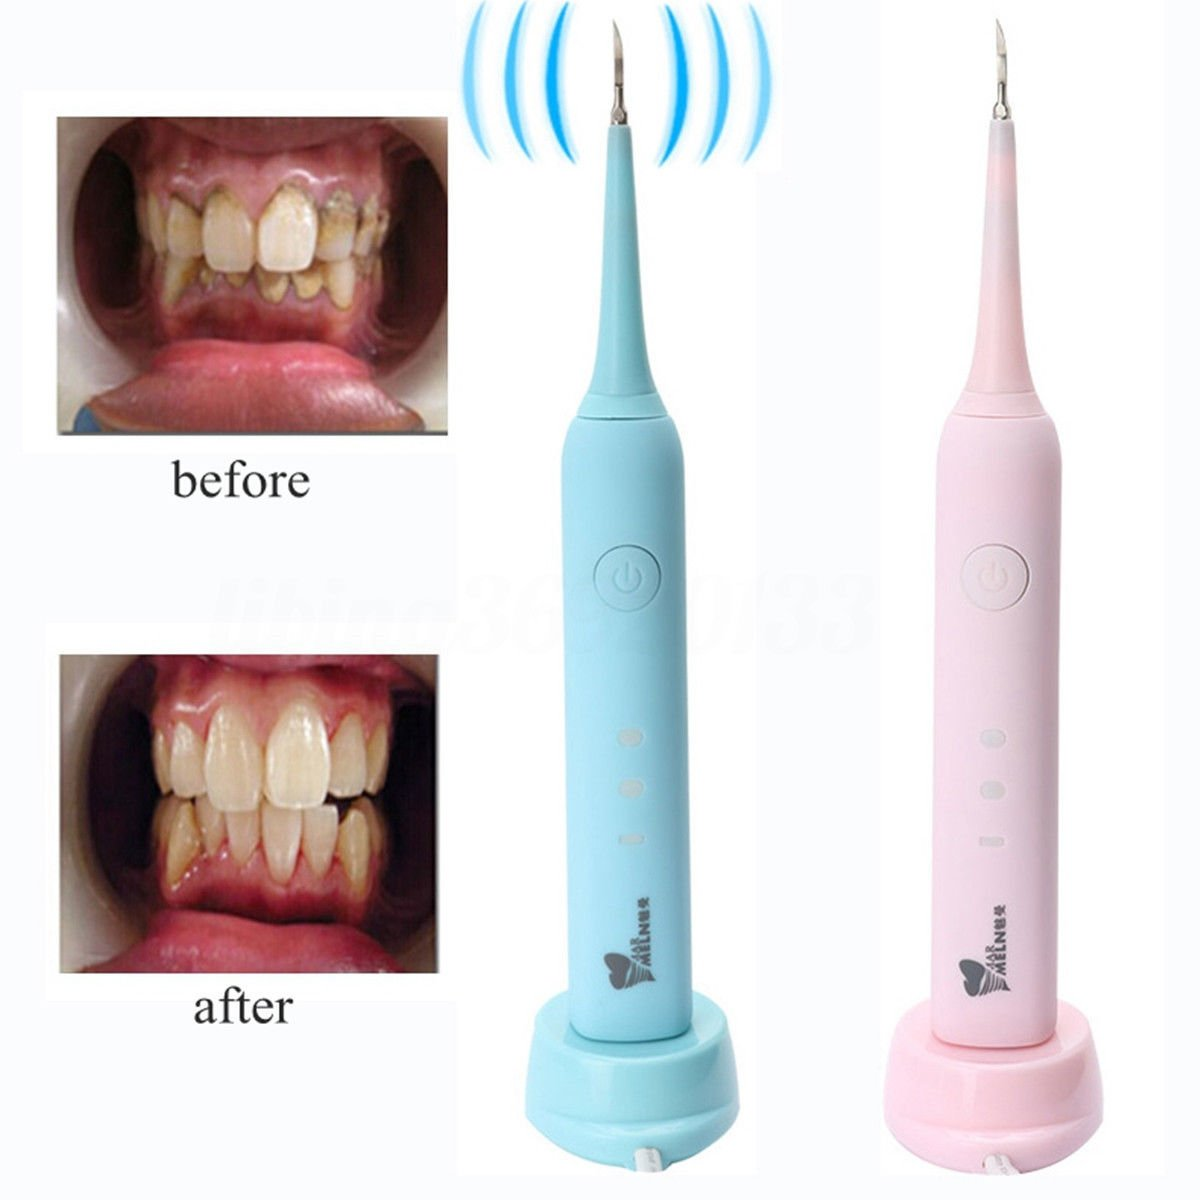 Amazon com: Ultrasonic Dental Calculus and Plaque Remover, Portable